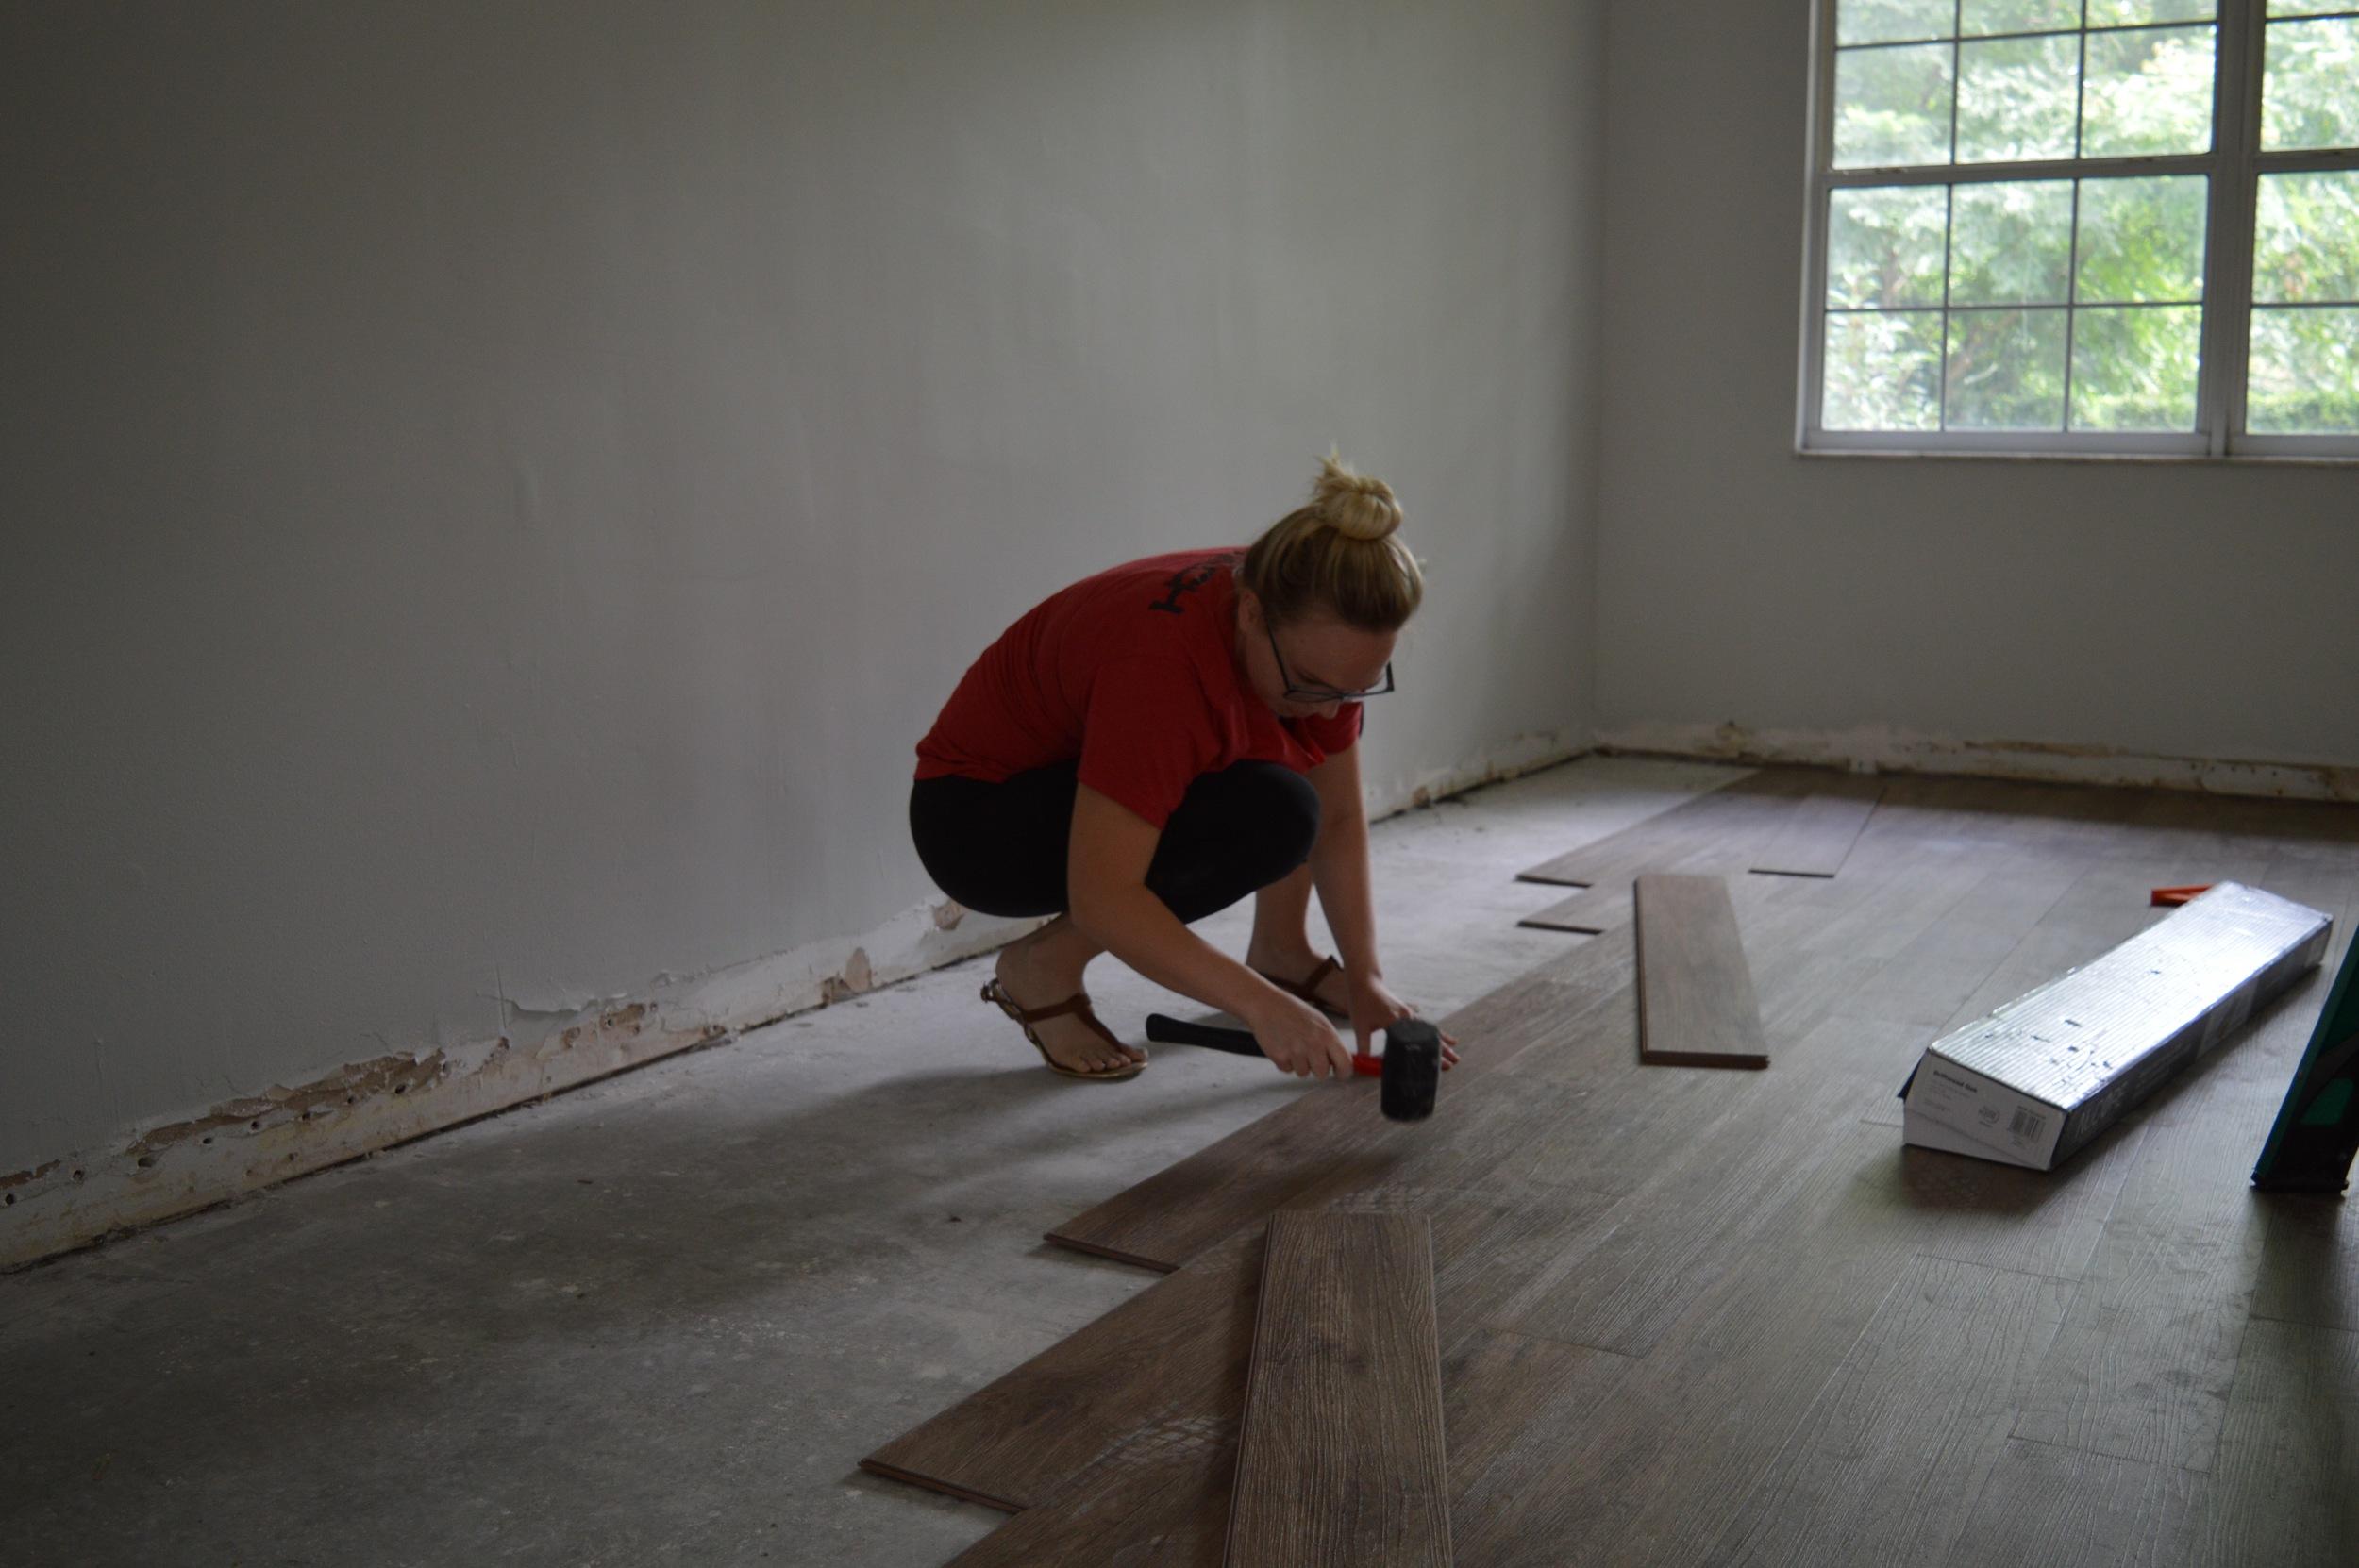 Nucore Vinyl Flooring in Driftwood